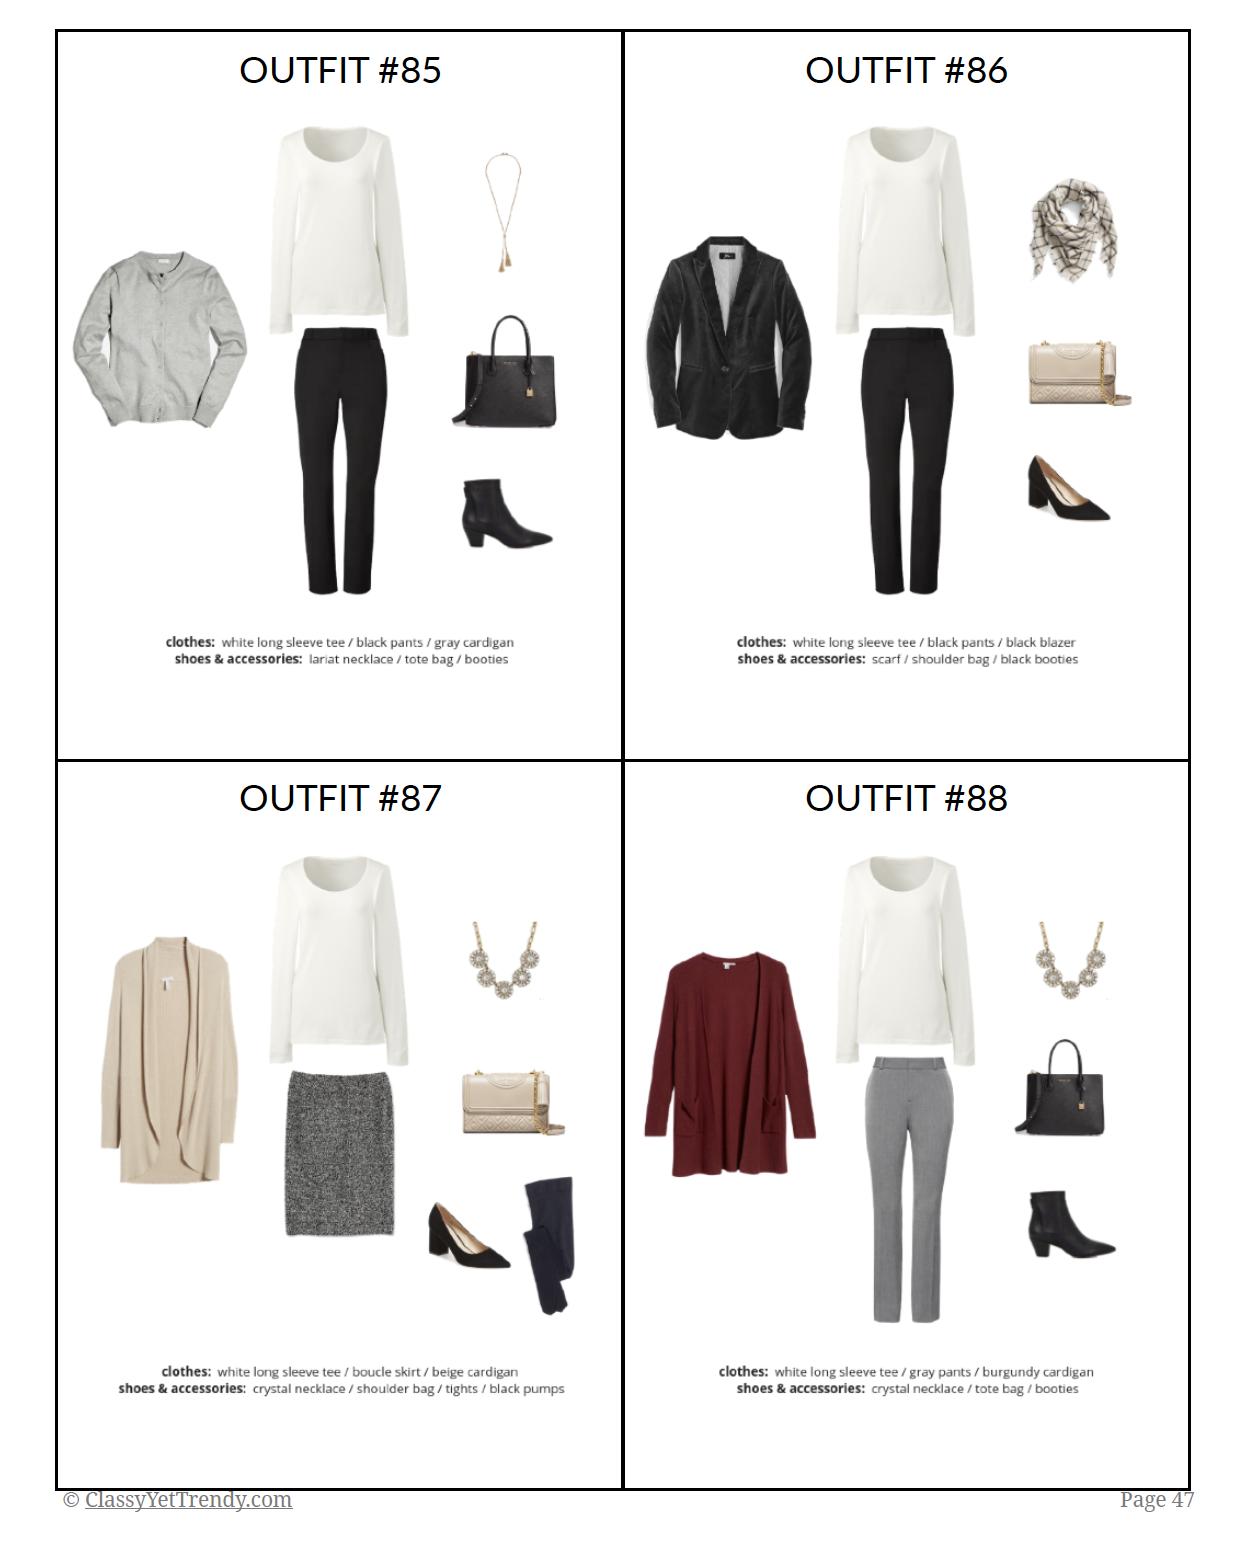 Workwear Winter 2018-2019 capsule wardrobe - page 47